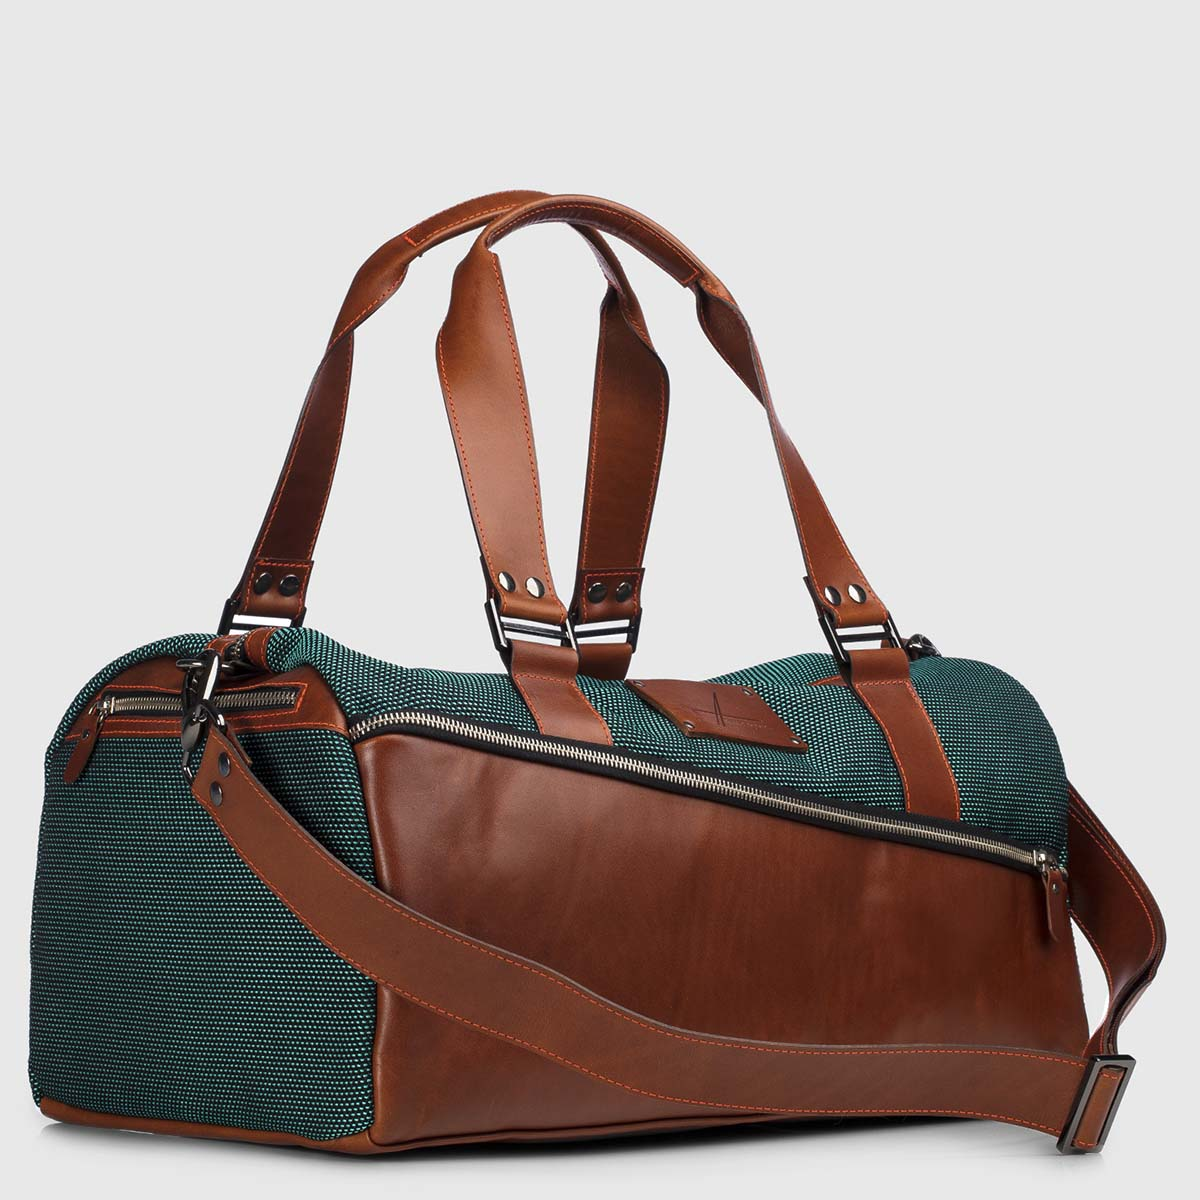 Green Stardust & Cognac Leather Duffle-bag